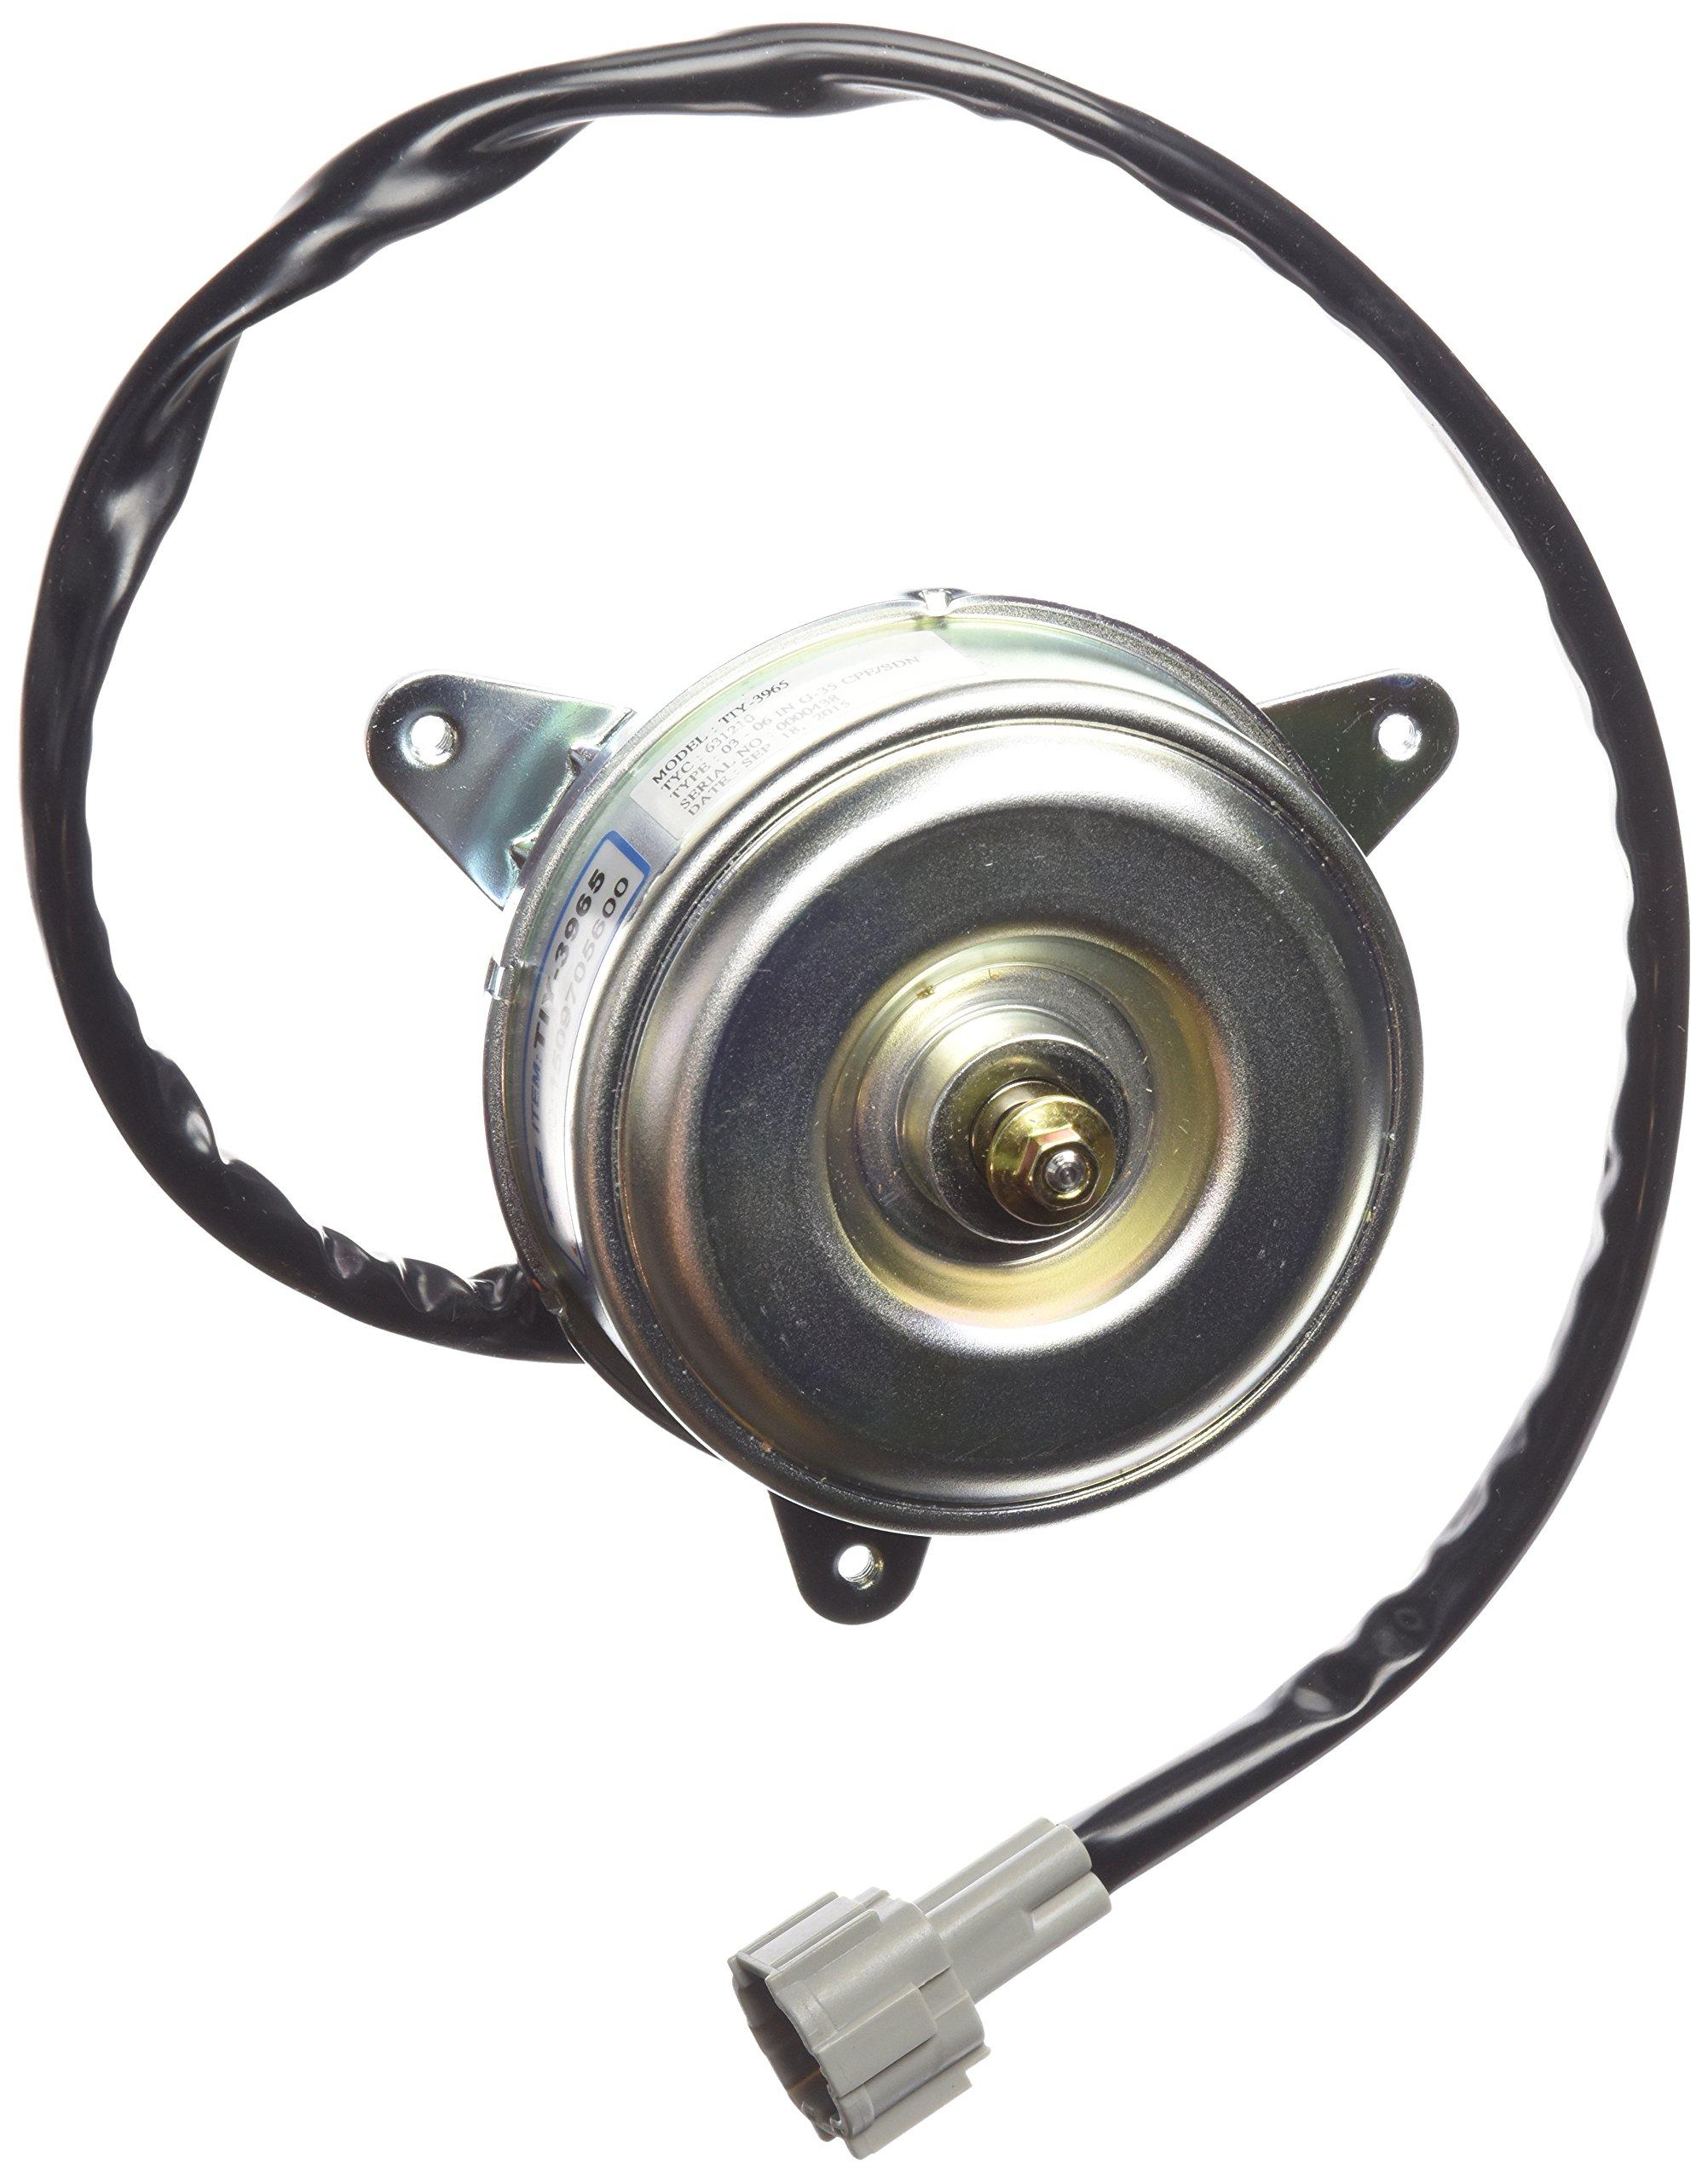 TYC 631210 Infiniti G-35 Replacement Radiator/Condenser Cooling Fan Motor